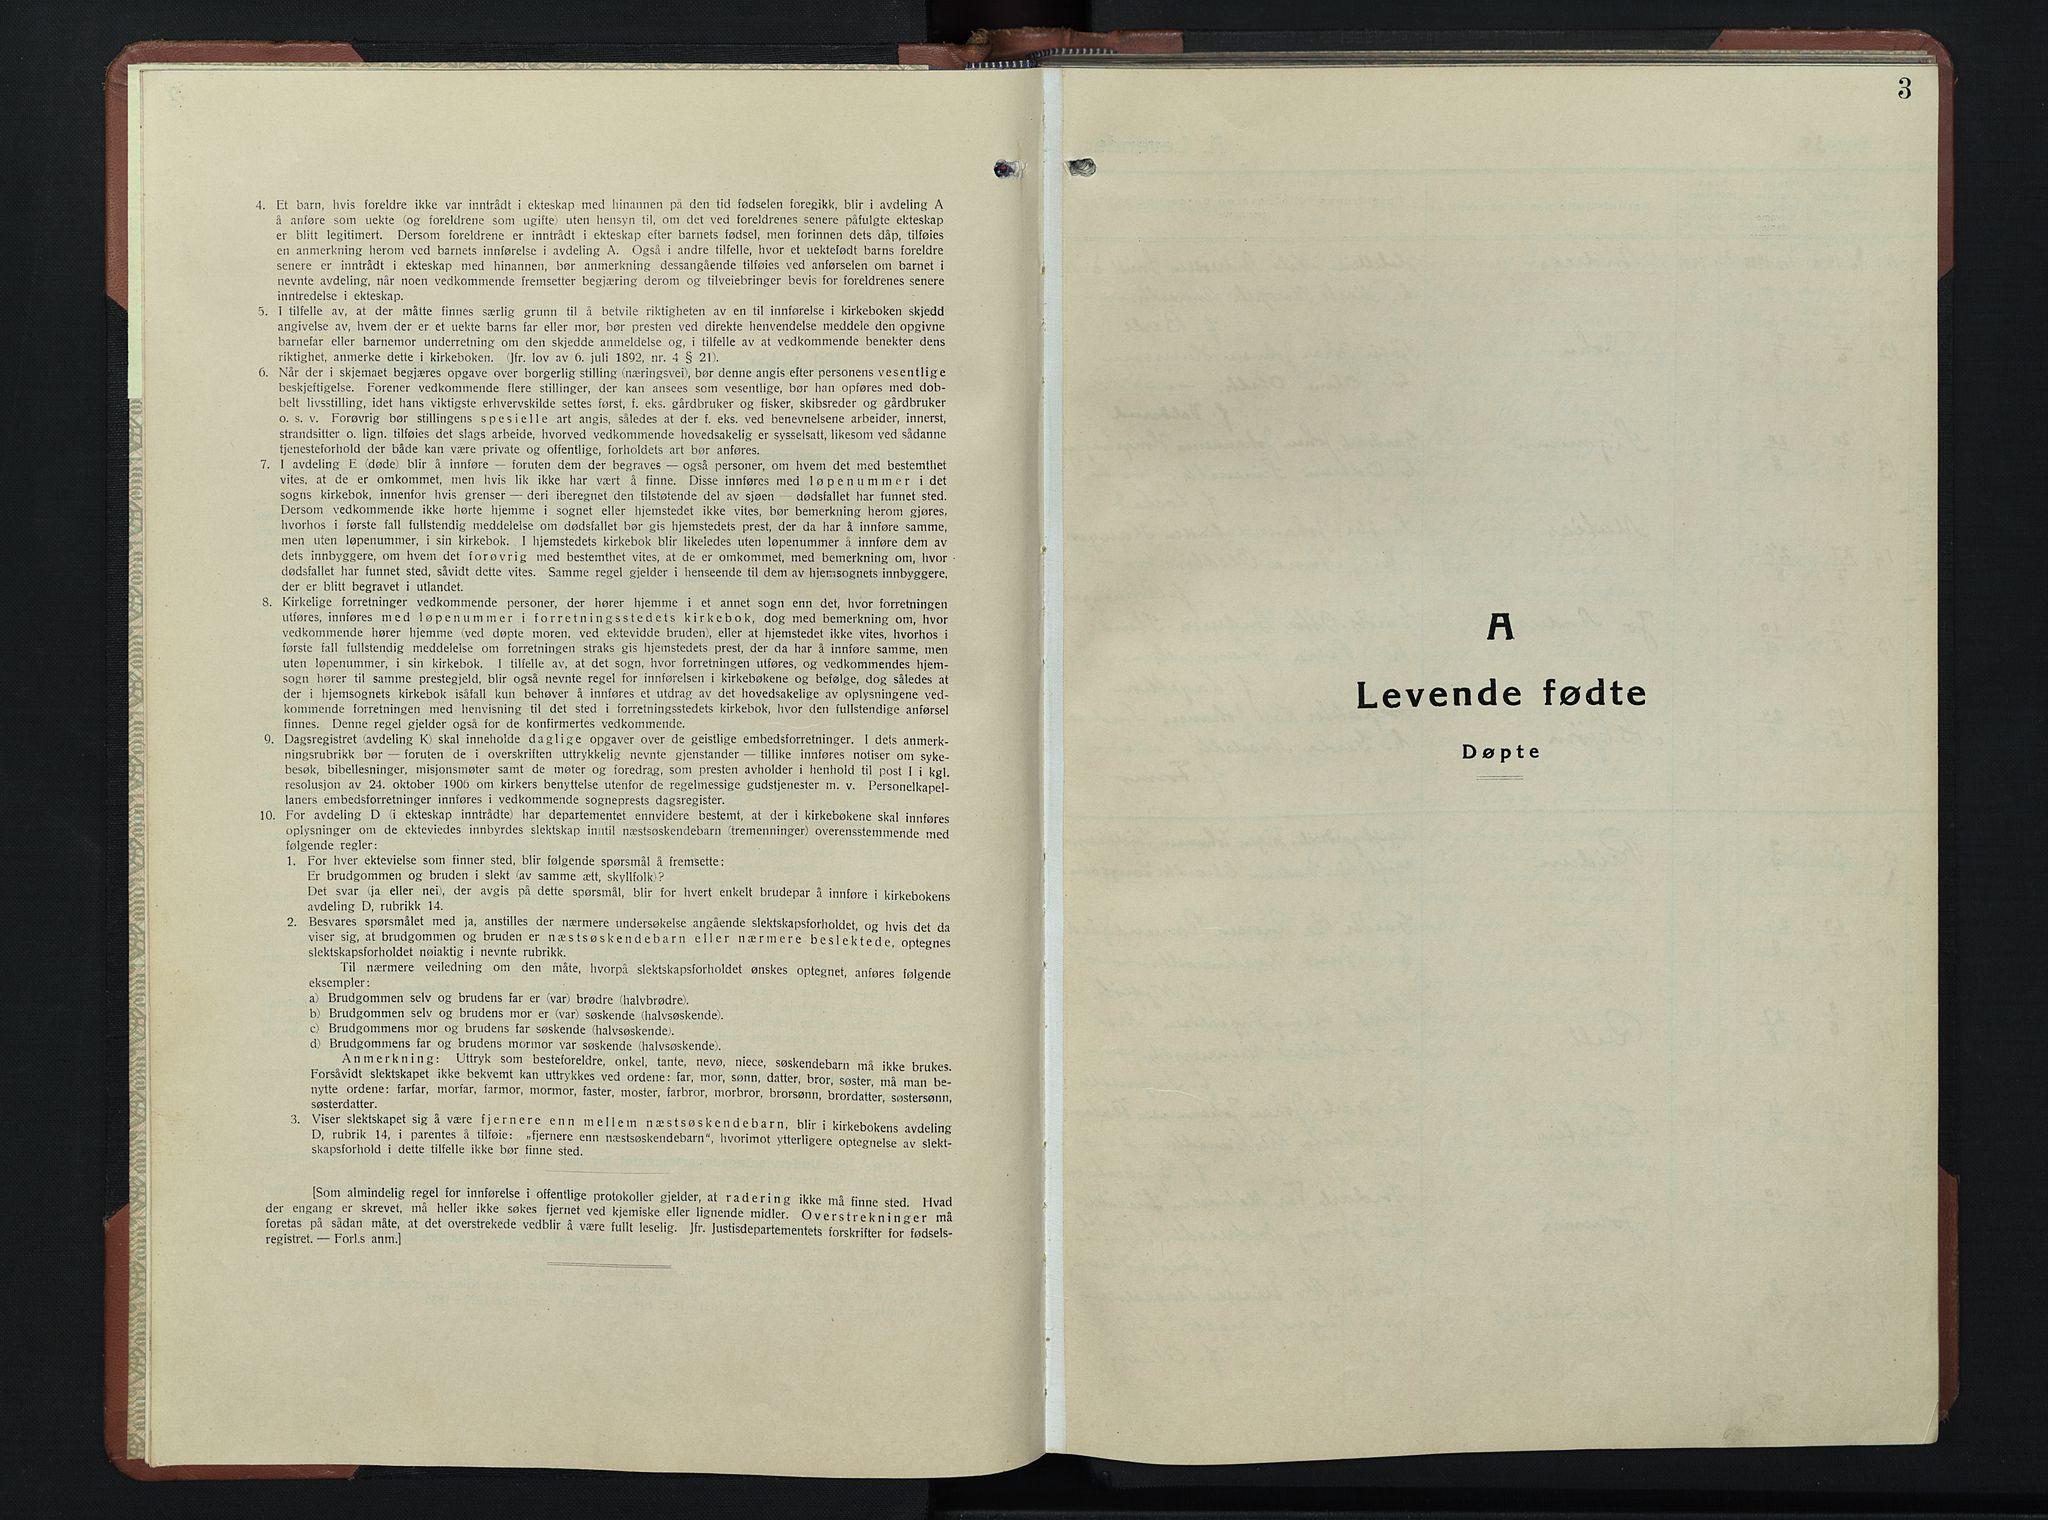 SAH, Øyer prestekontor, Klokkerbok nr. 9, 1939-1953, s. 3